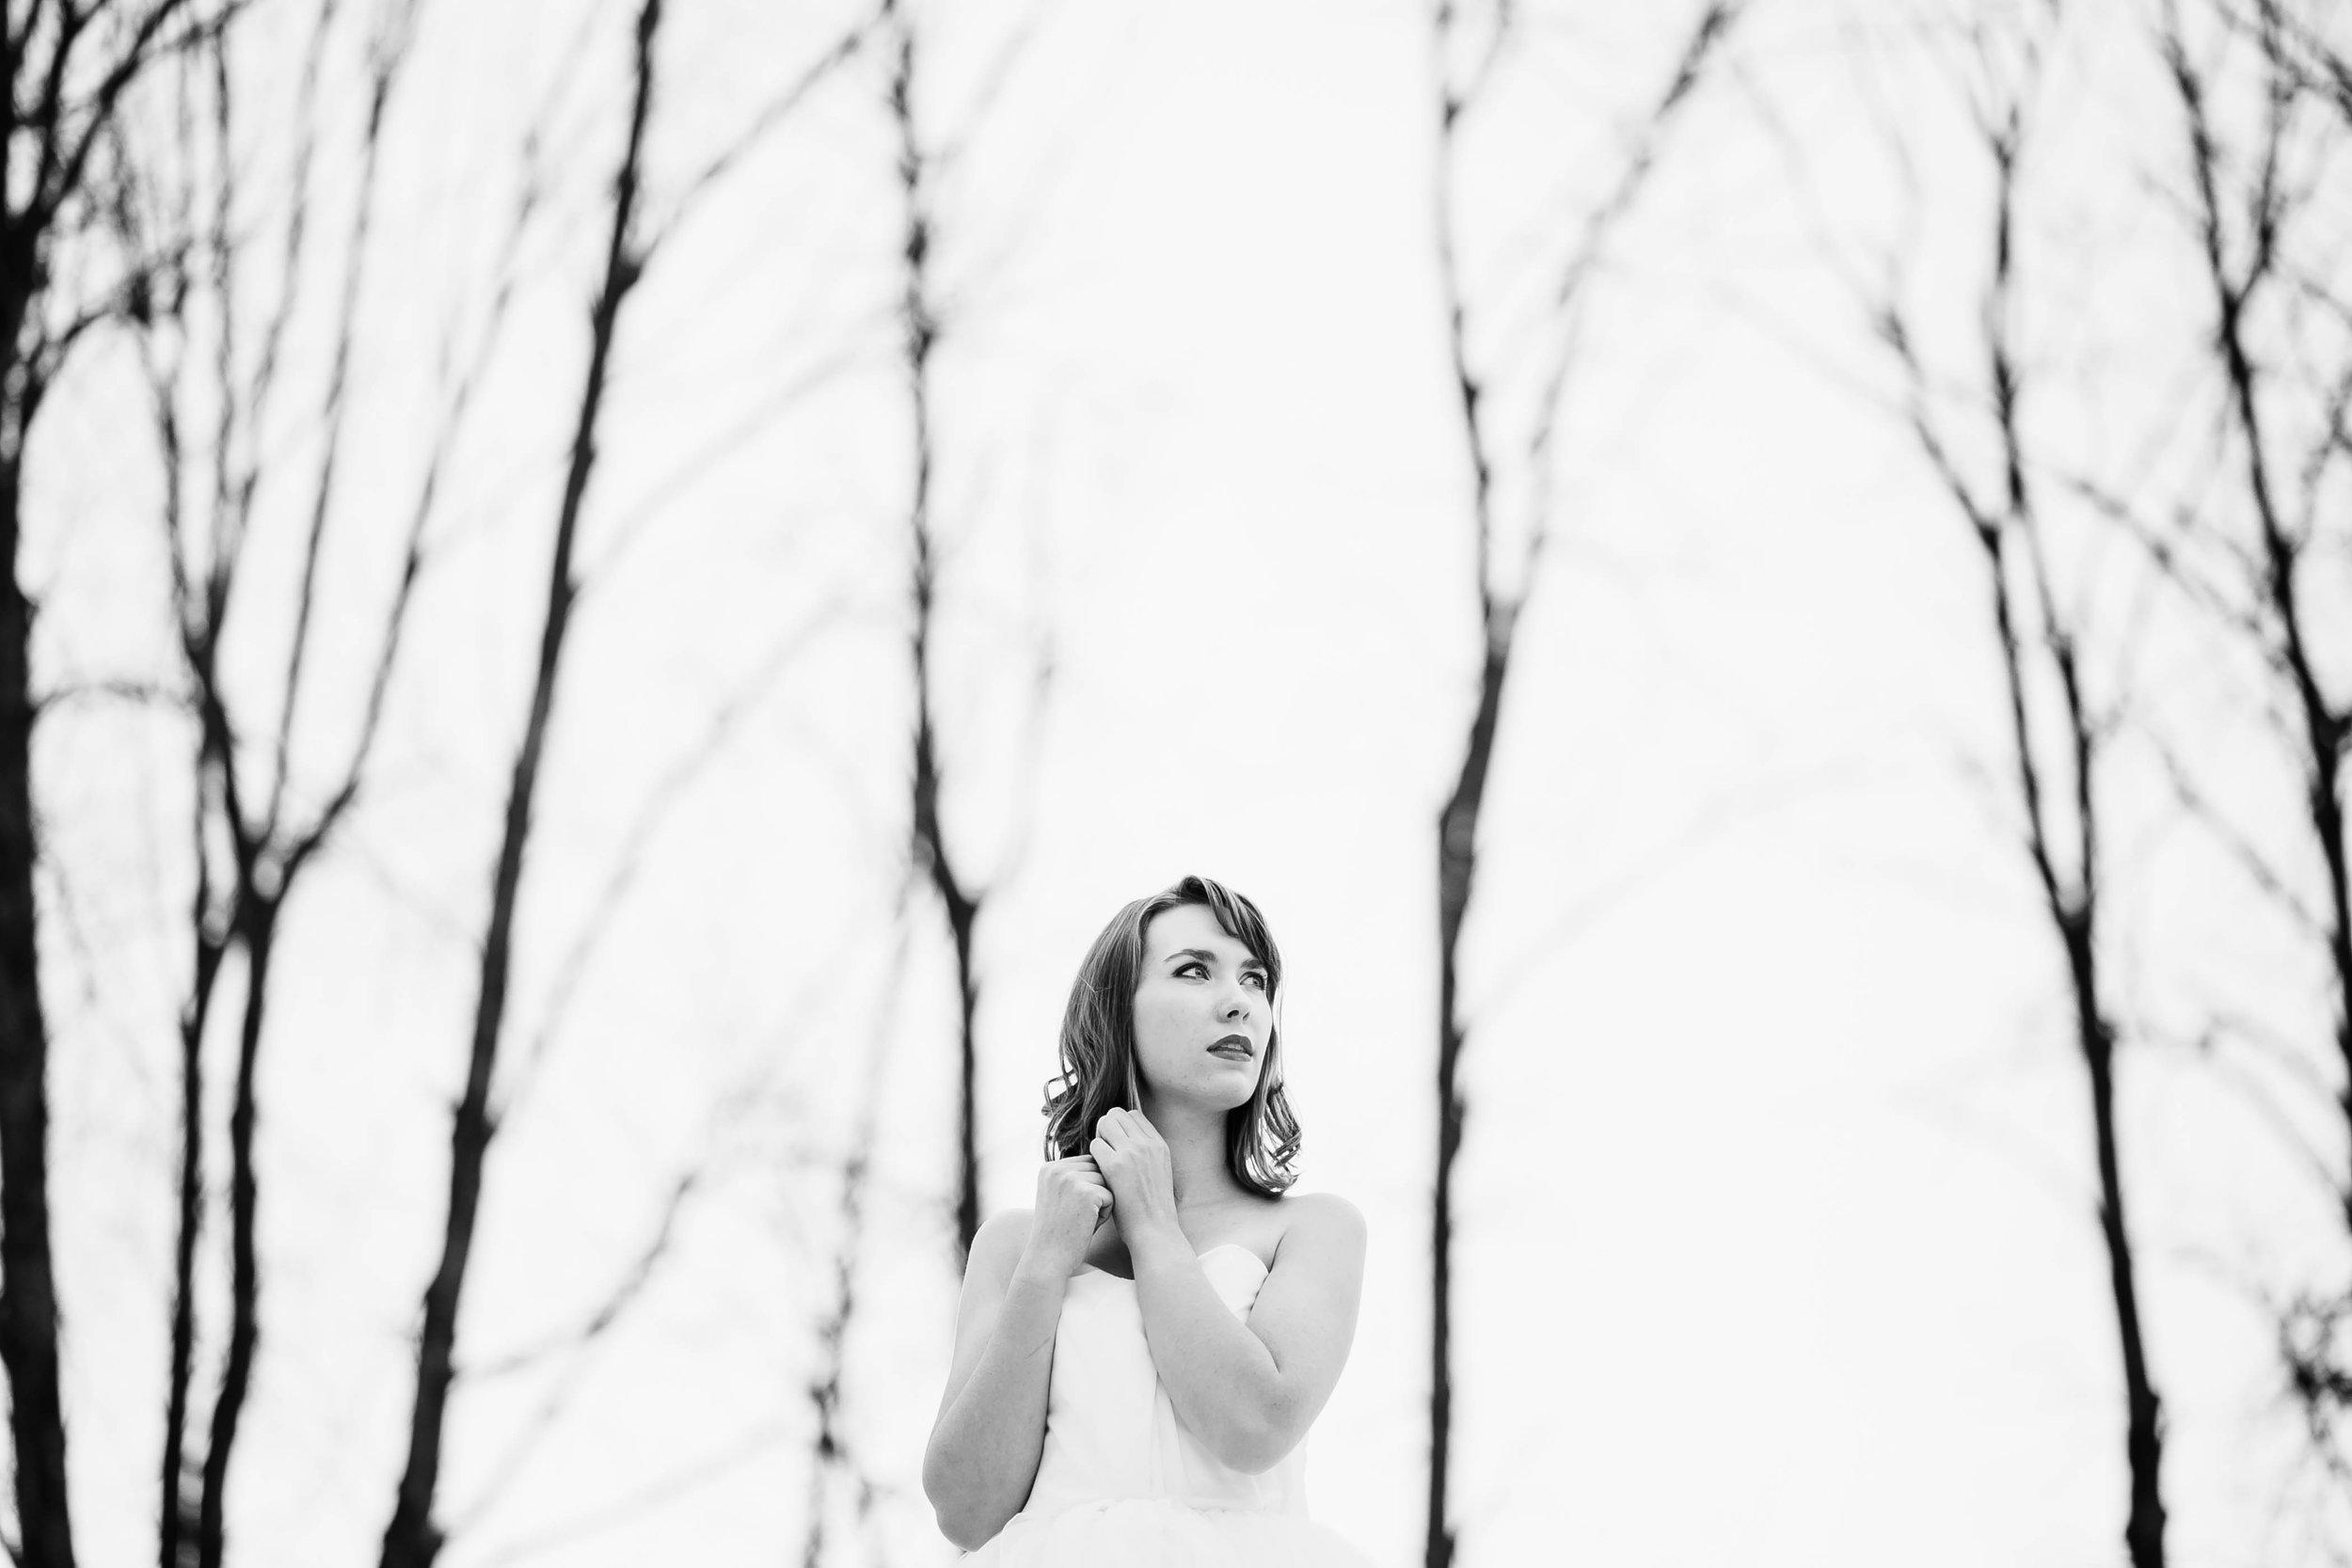 SarahSovereignPhotography_KateFairley (4).jpg